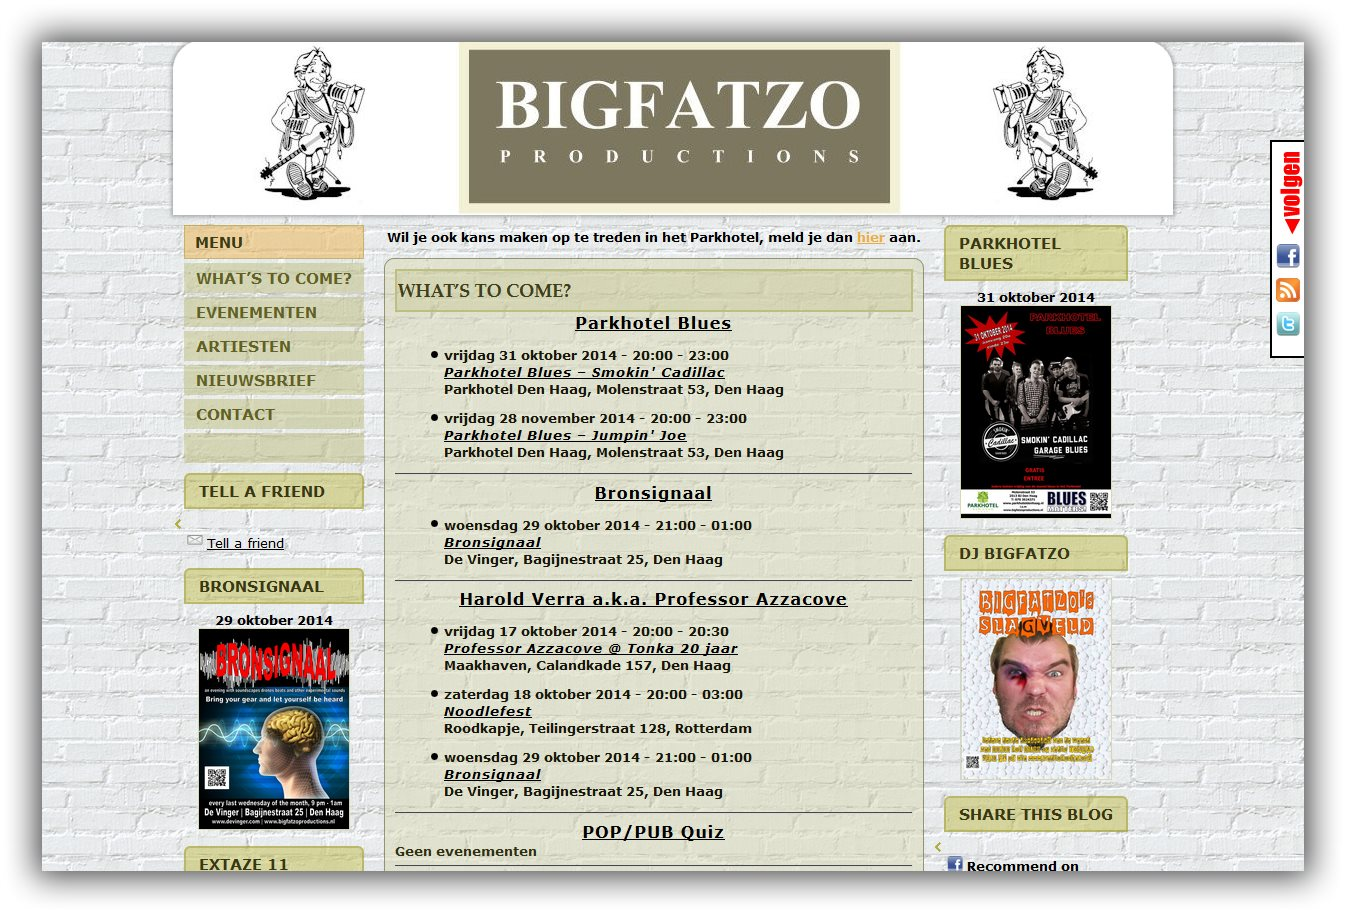 Bigfatzo Productions